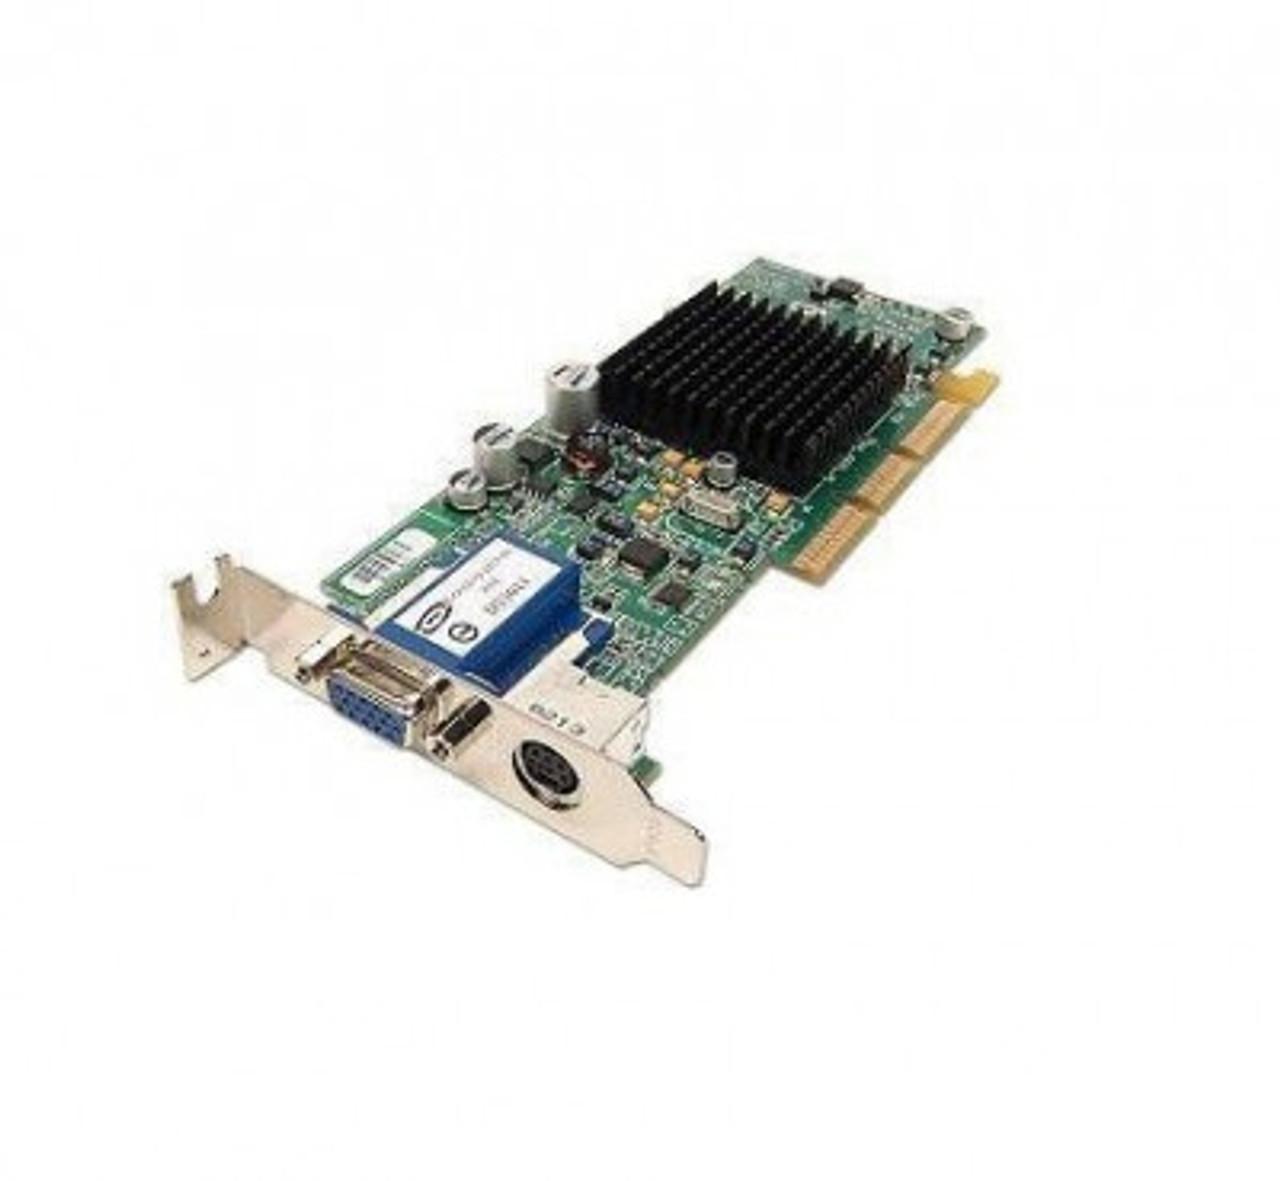 06T975 - Dell ATI Radeon 7500 AGP 32MB Video Card for Dell Optiplex GX260